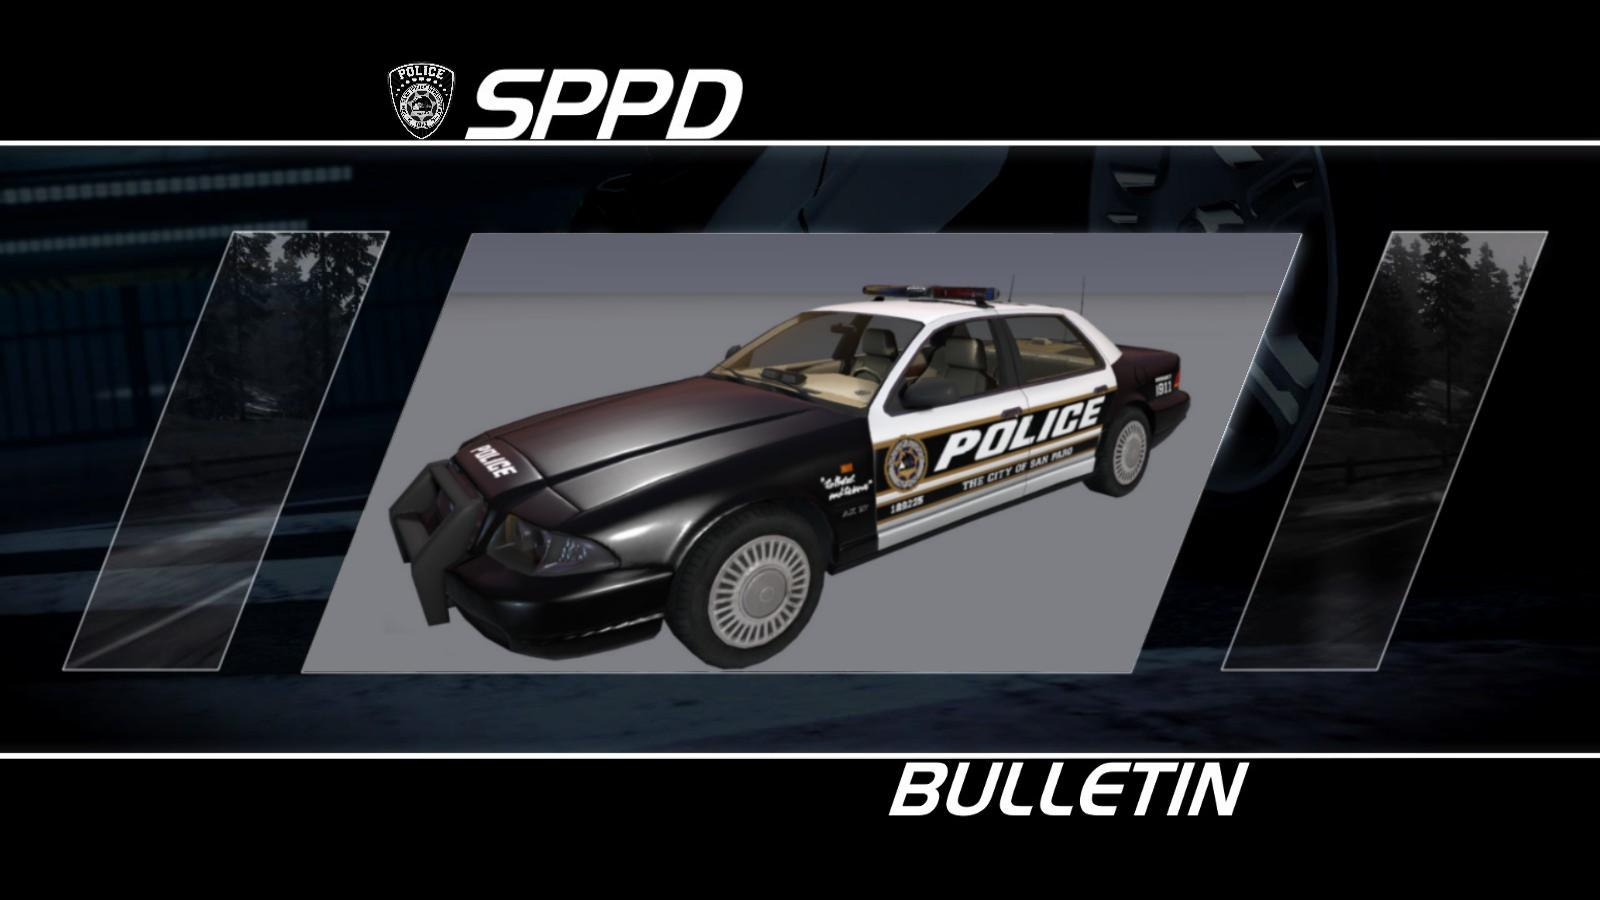 Police_Broadwing_Bulletin.png